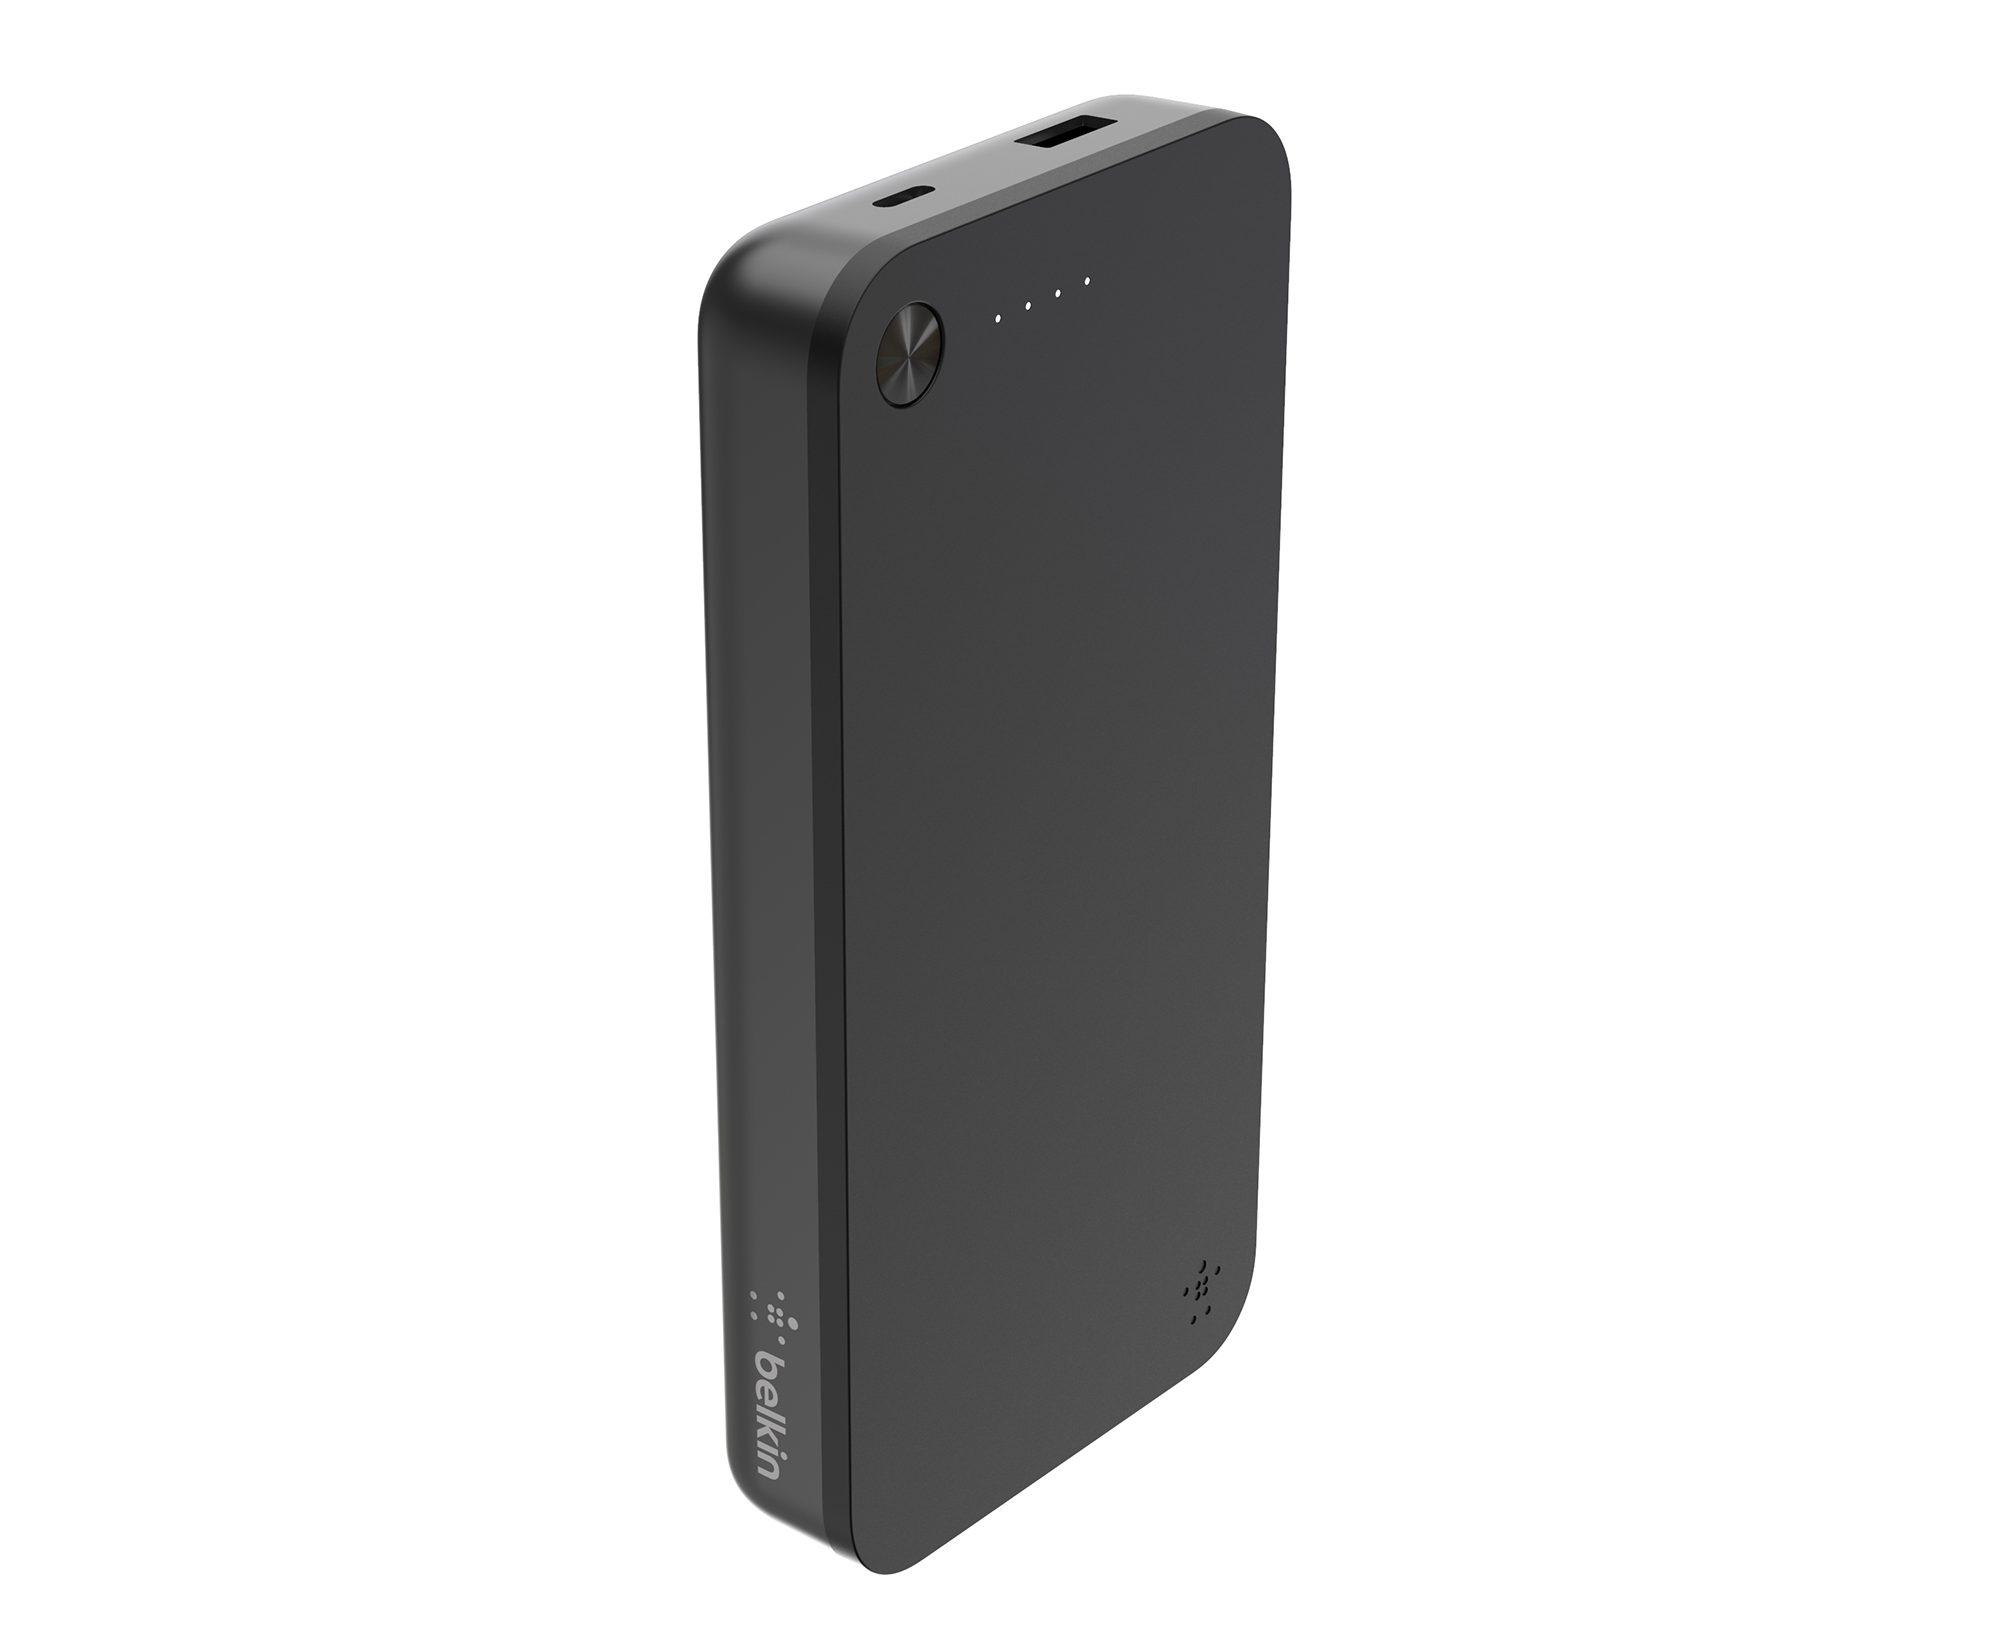 BoostCharge Power Bank USB-C de Belkin